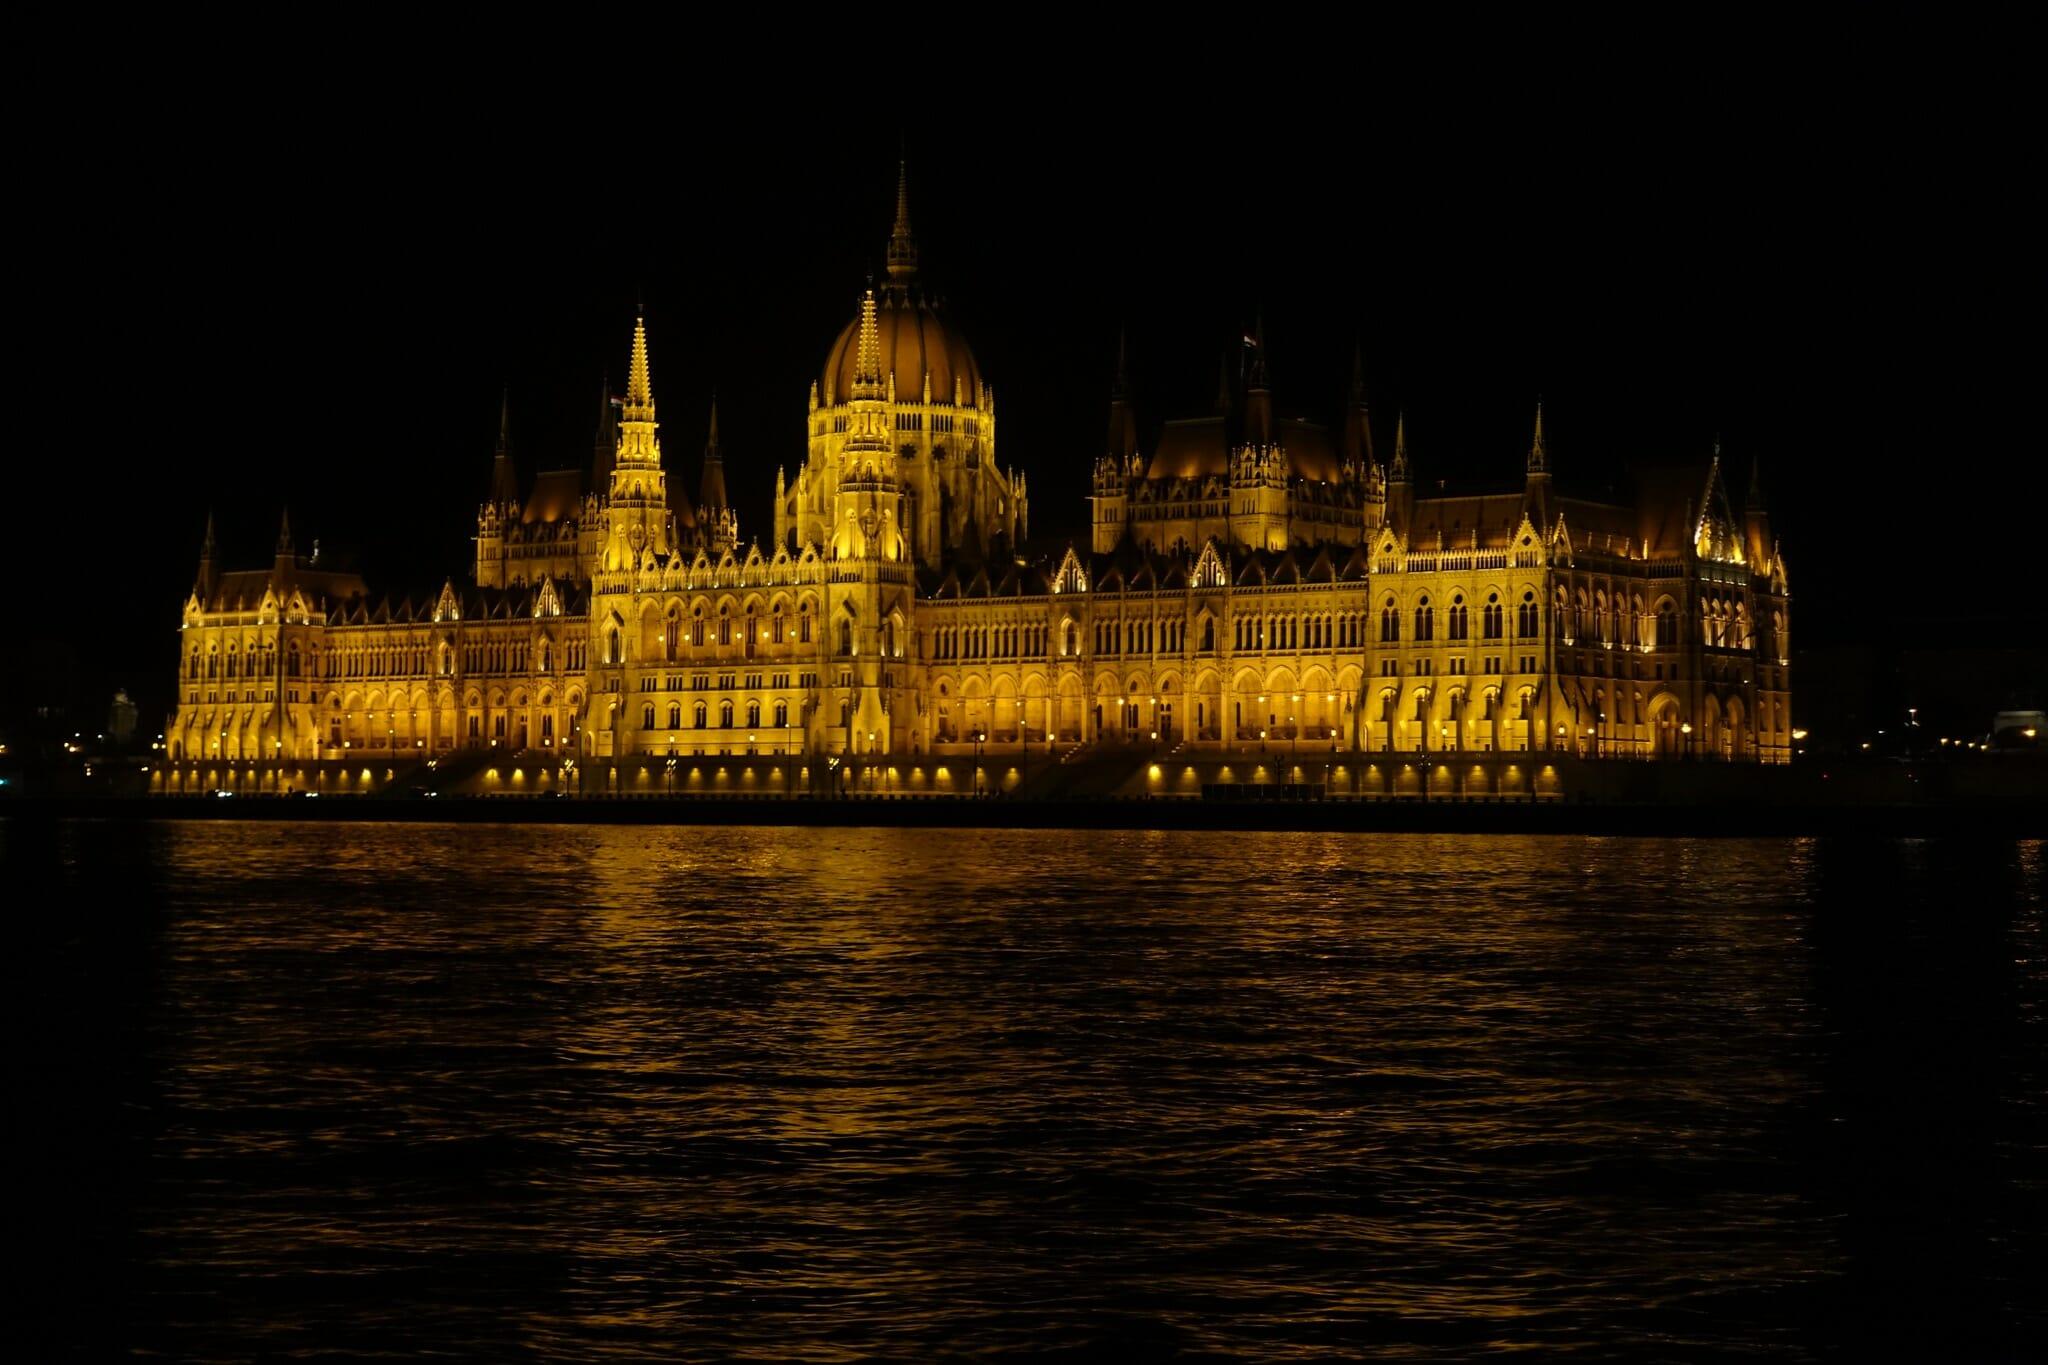 The Parliament Buidling illuminated at night